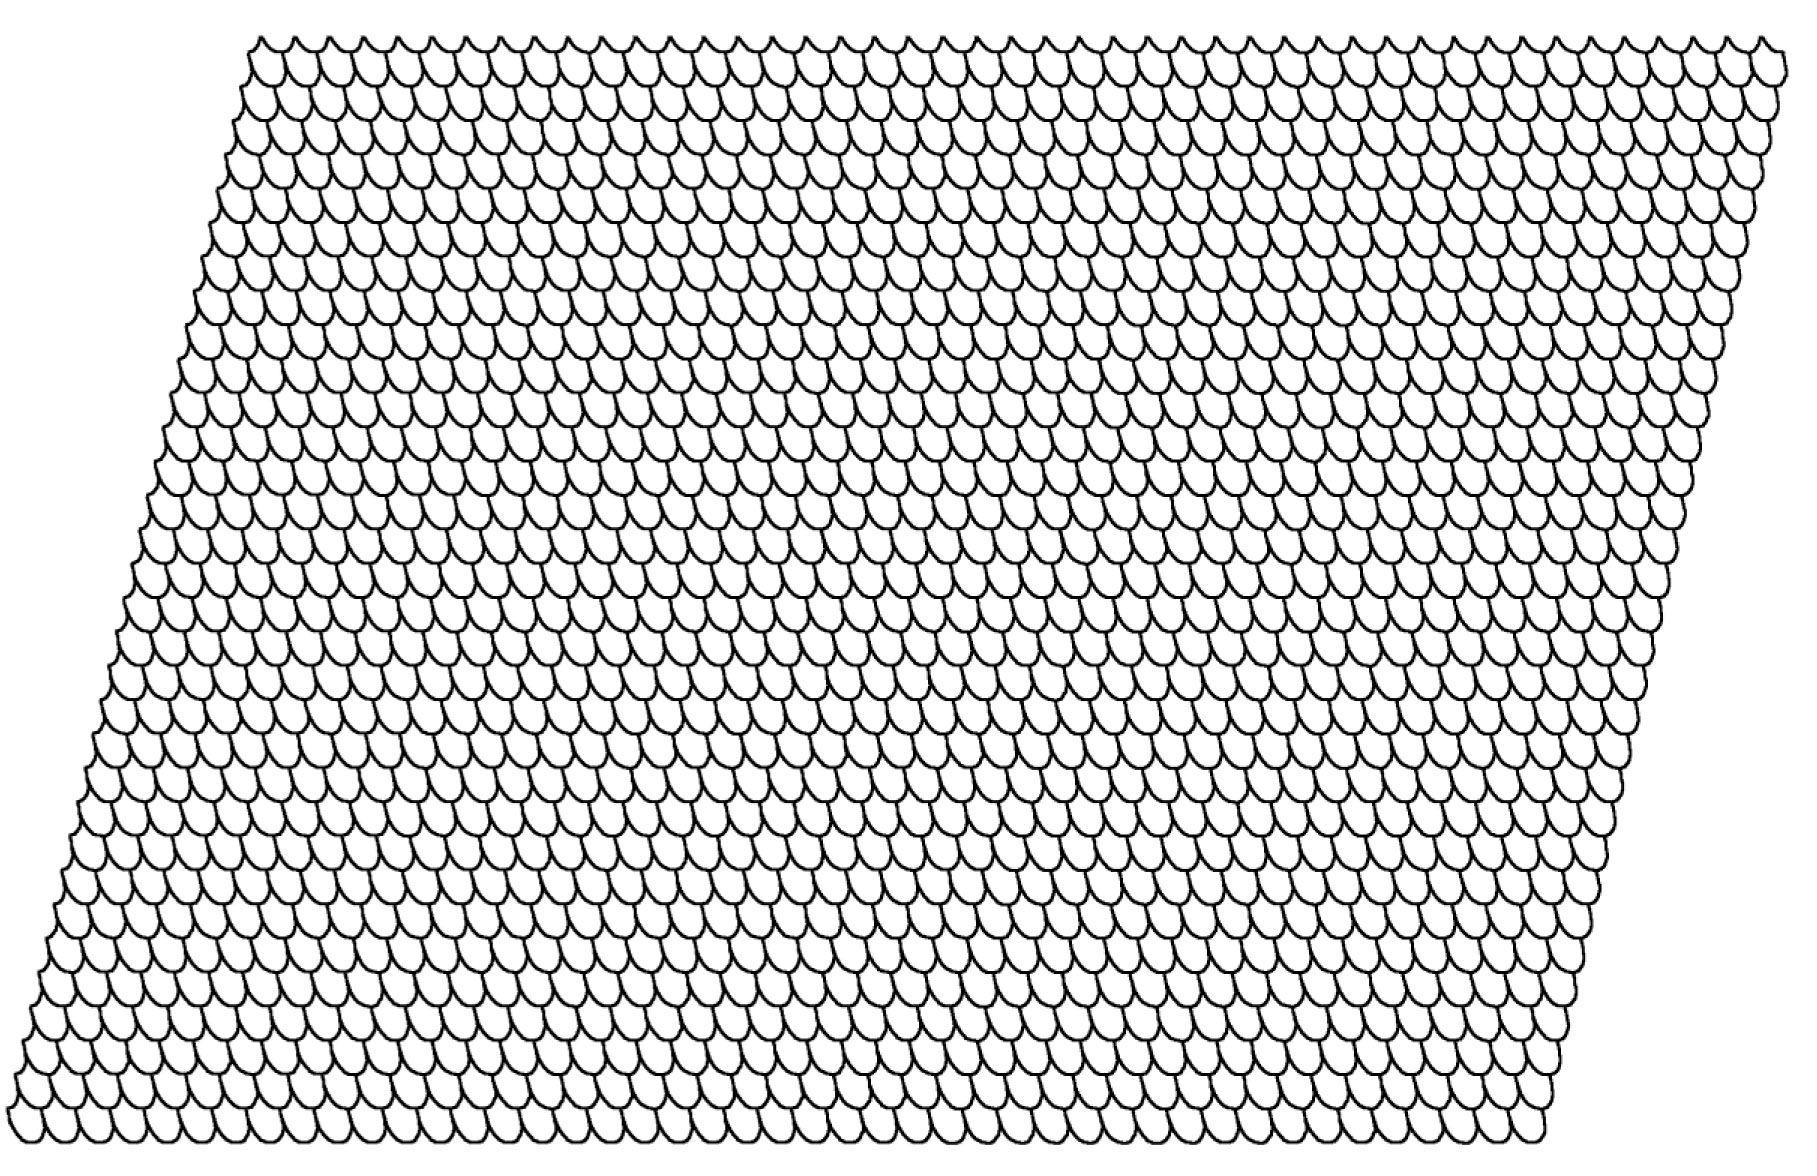 Tapestry Crochet Graph Paper | DIY | Pinterest | Häkelideen, Häkeln ...